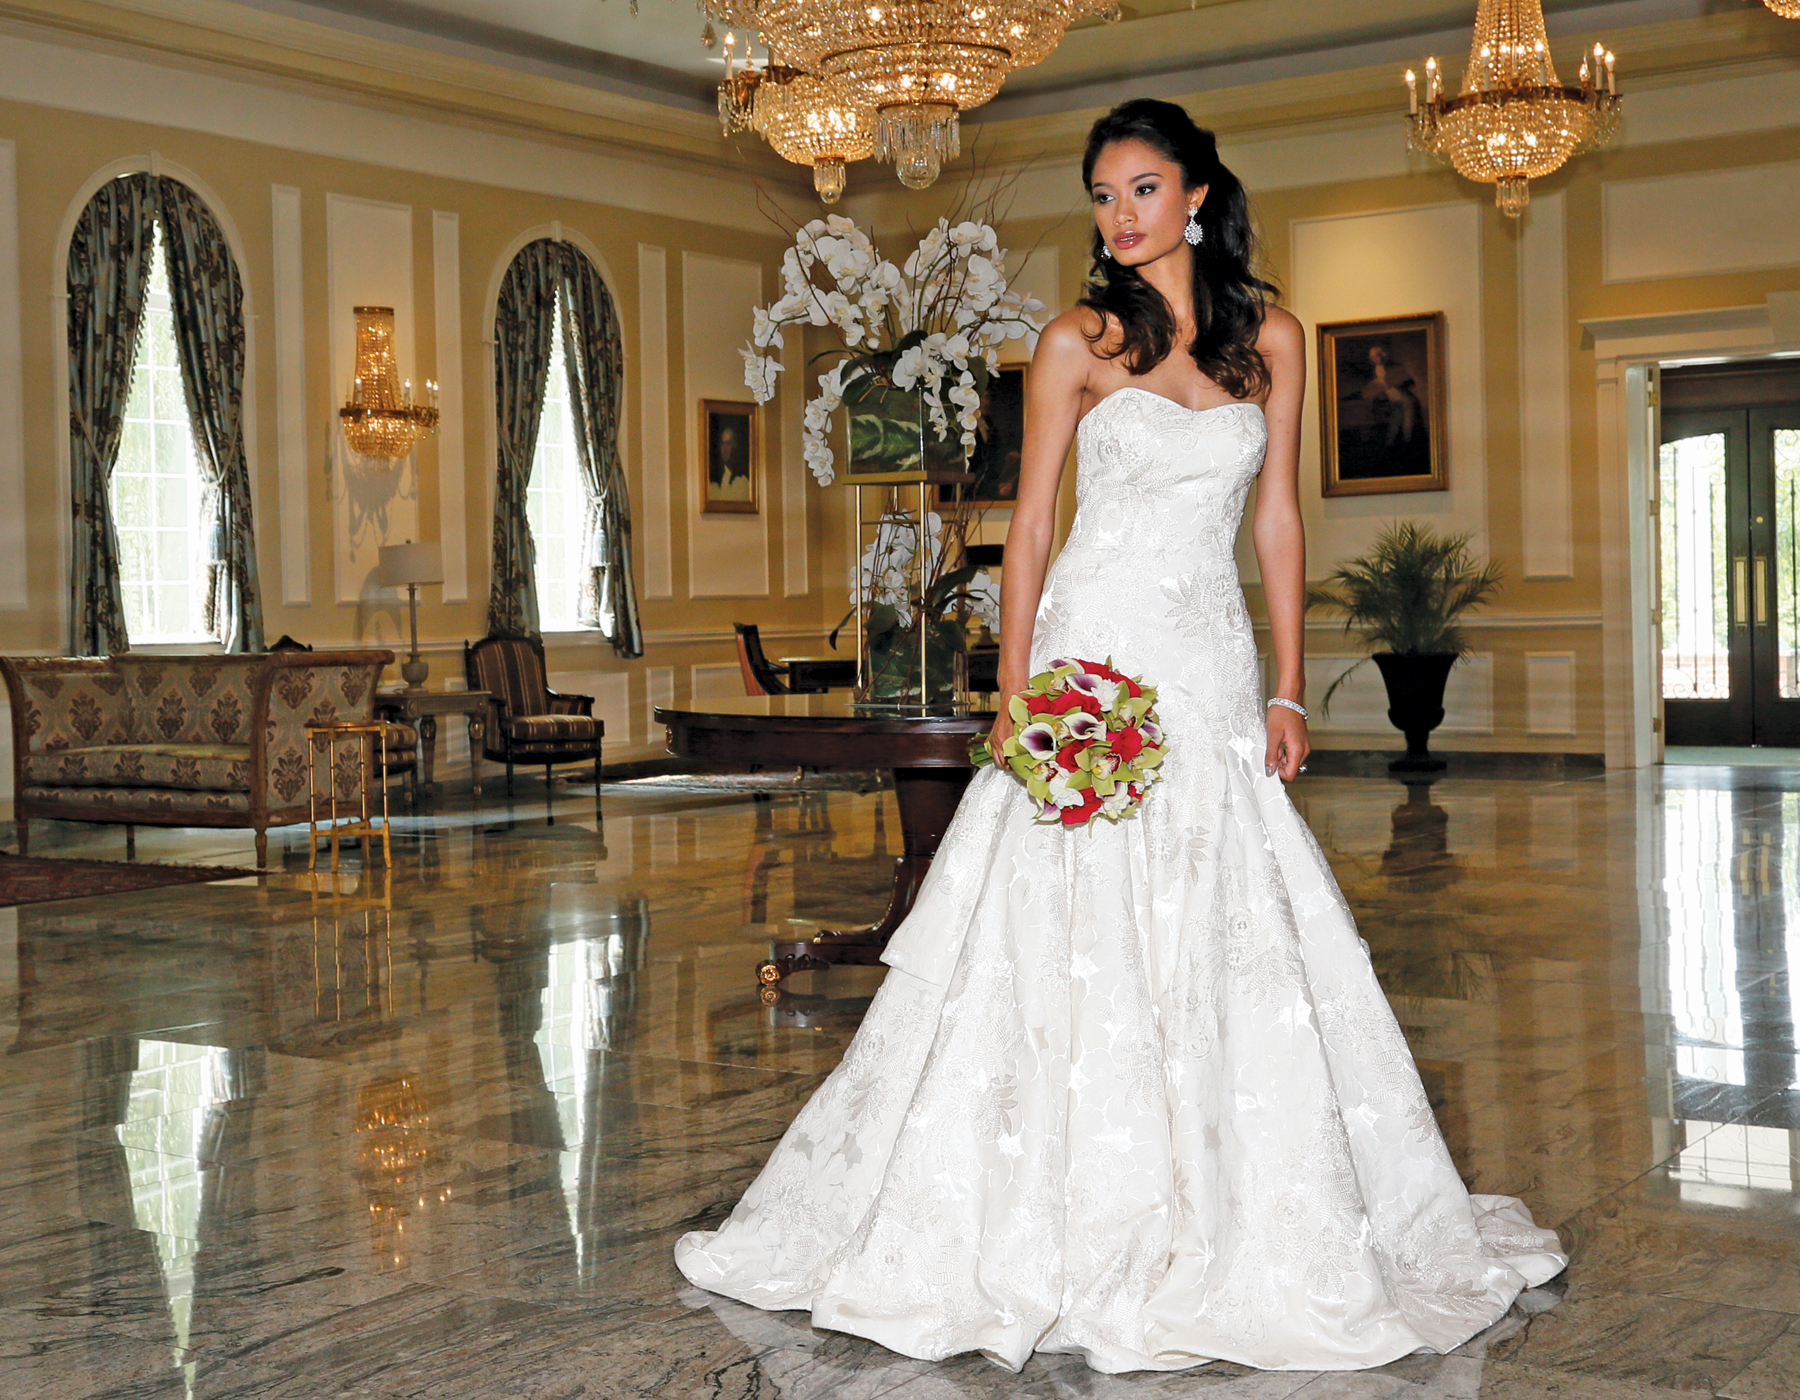 Oleg Cassini Bridal Wedding Fashions in NYC